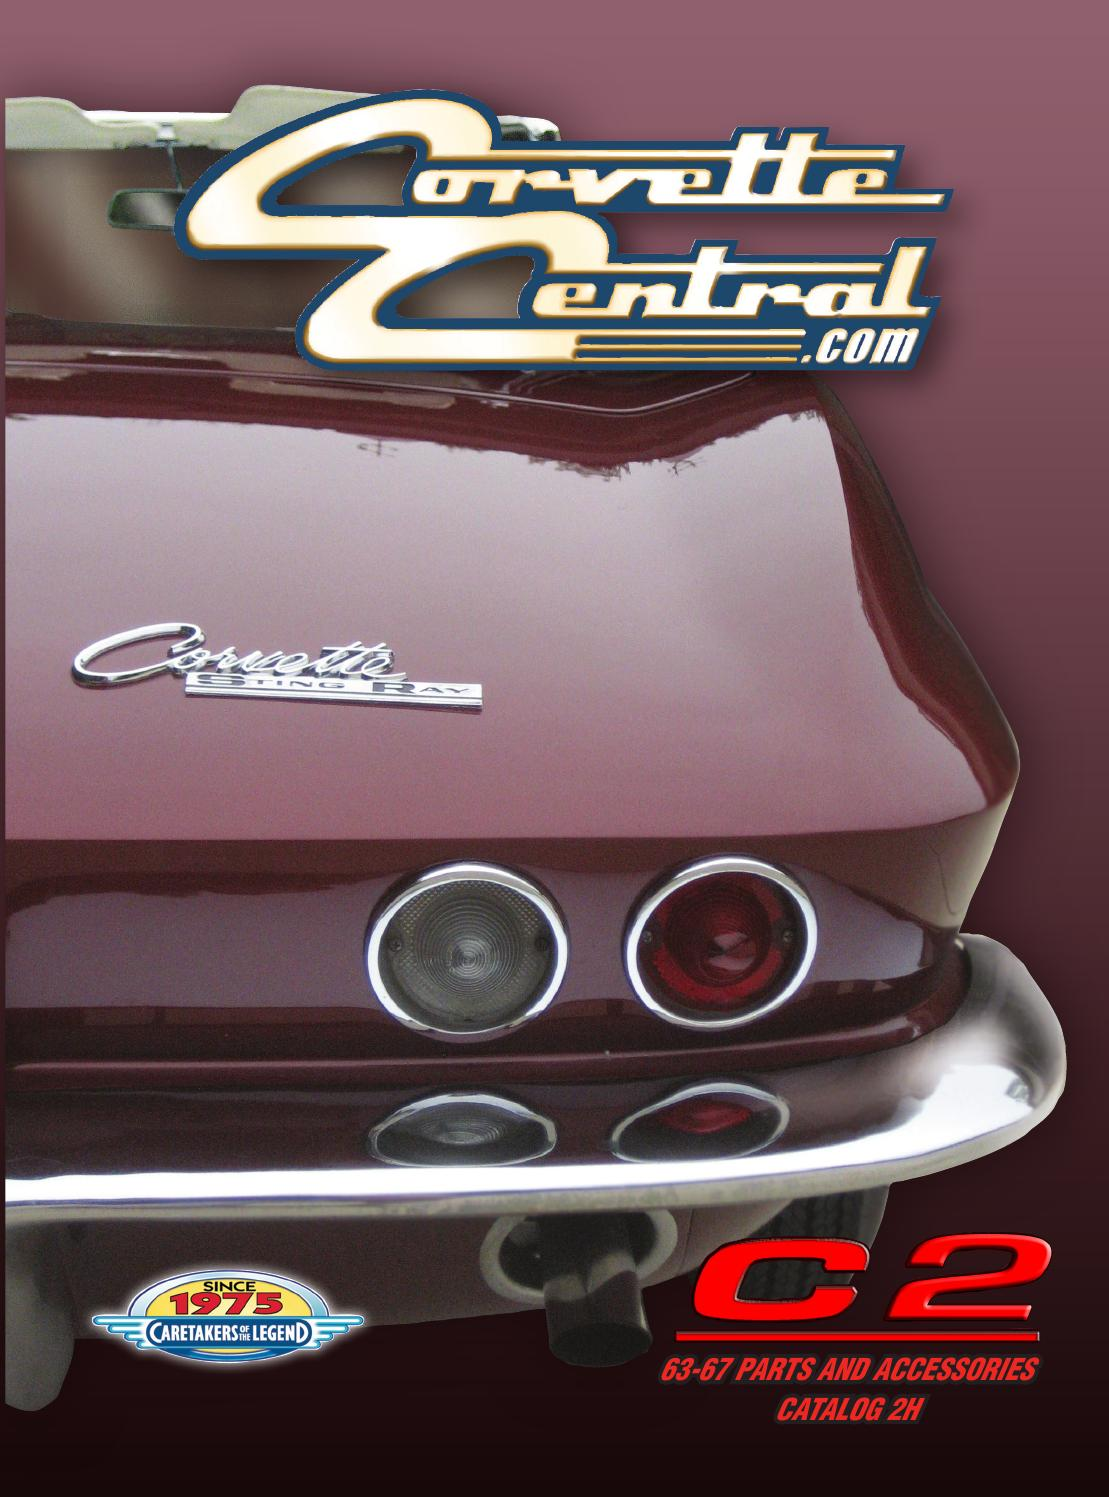 Corvette Central C2 63 67 Parts Catalog By Chevy 350 Pcv Diagram Issuu